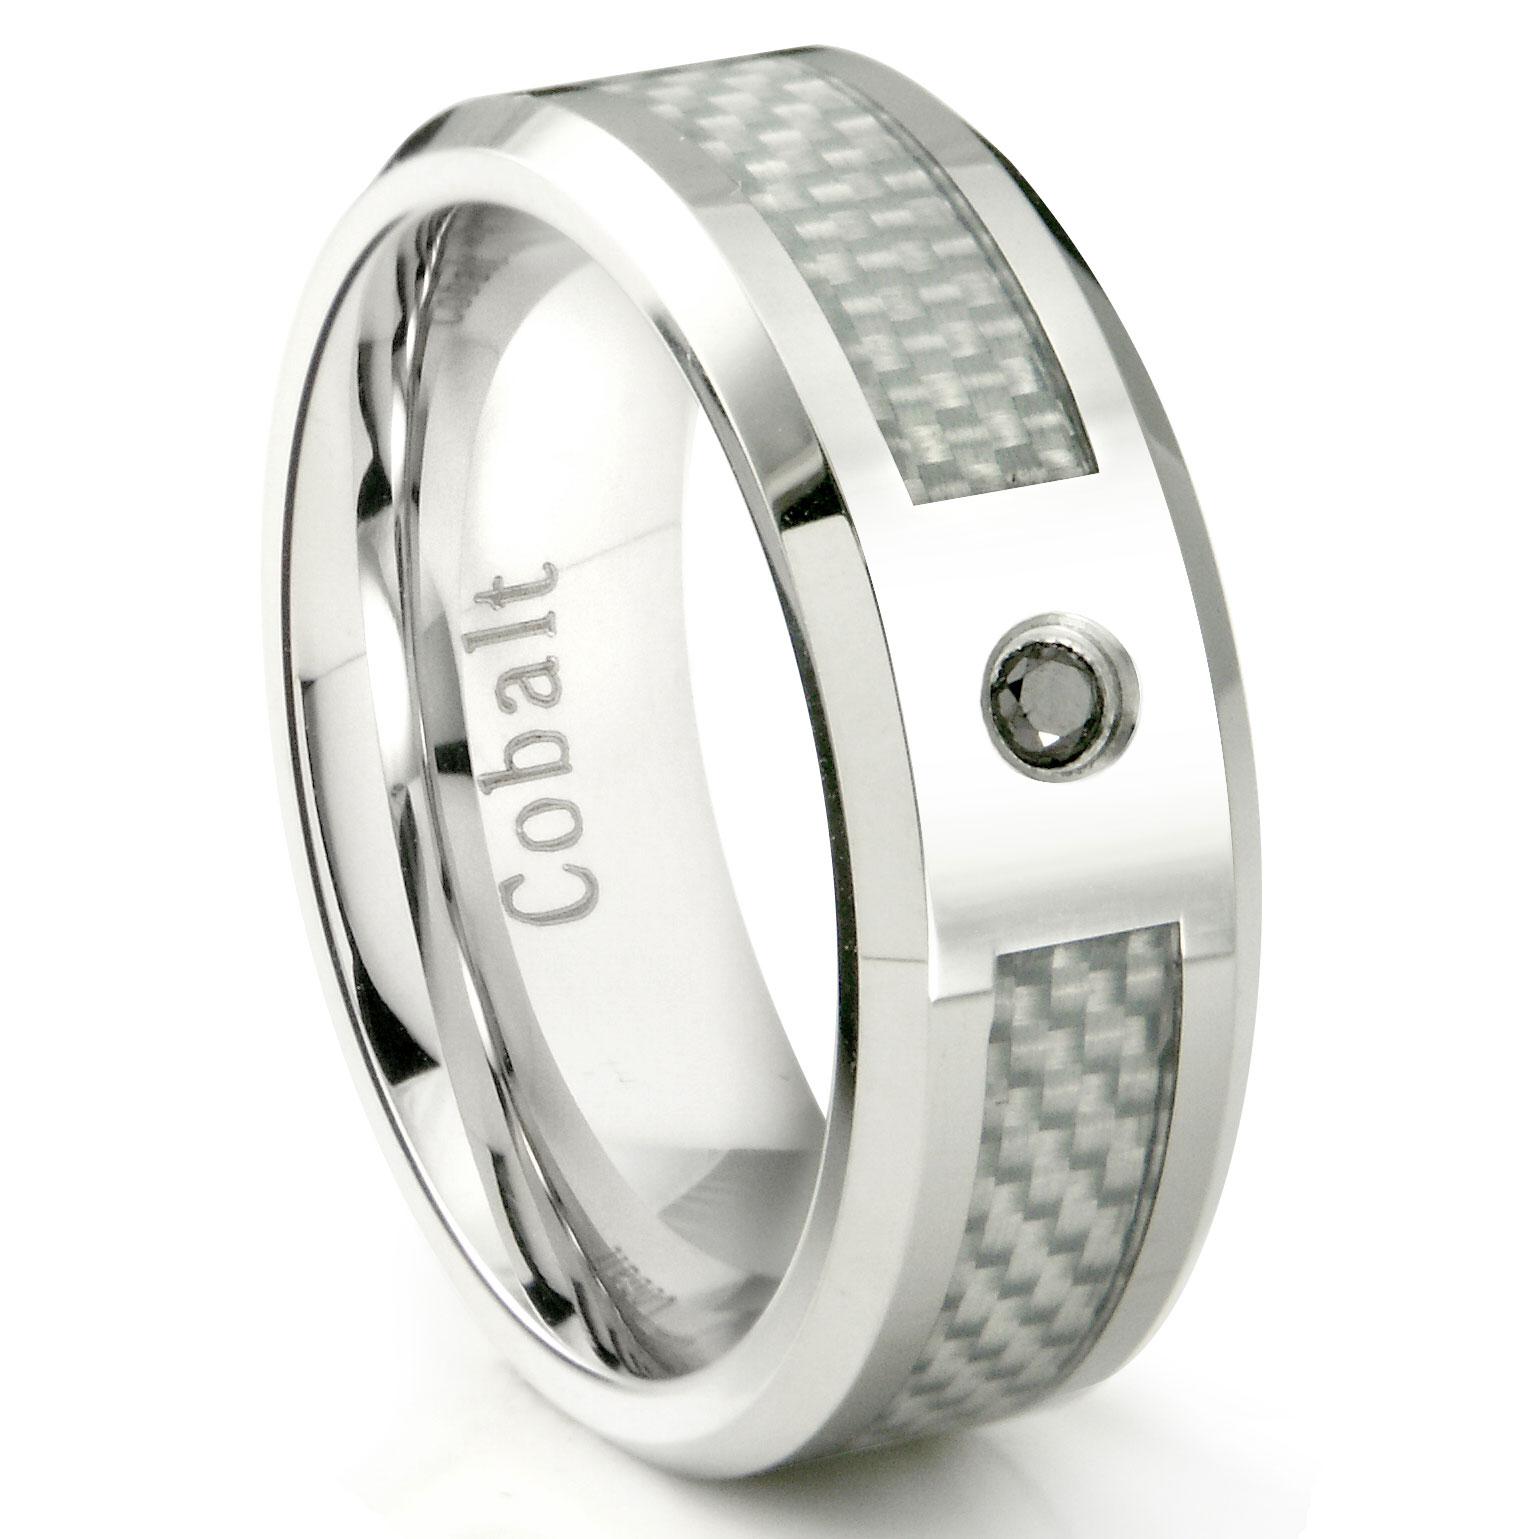 Cobalt Chrome 8MM Black Diamond White Carbon Fiber Inlay Wedding Band Ring P carbon fiber wedding bands Loading zoom